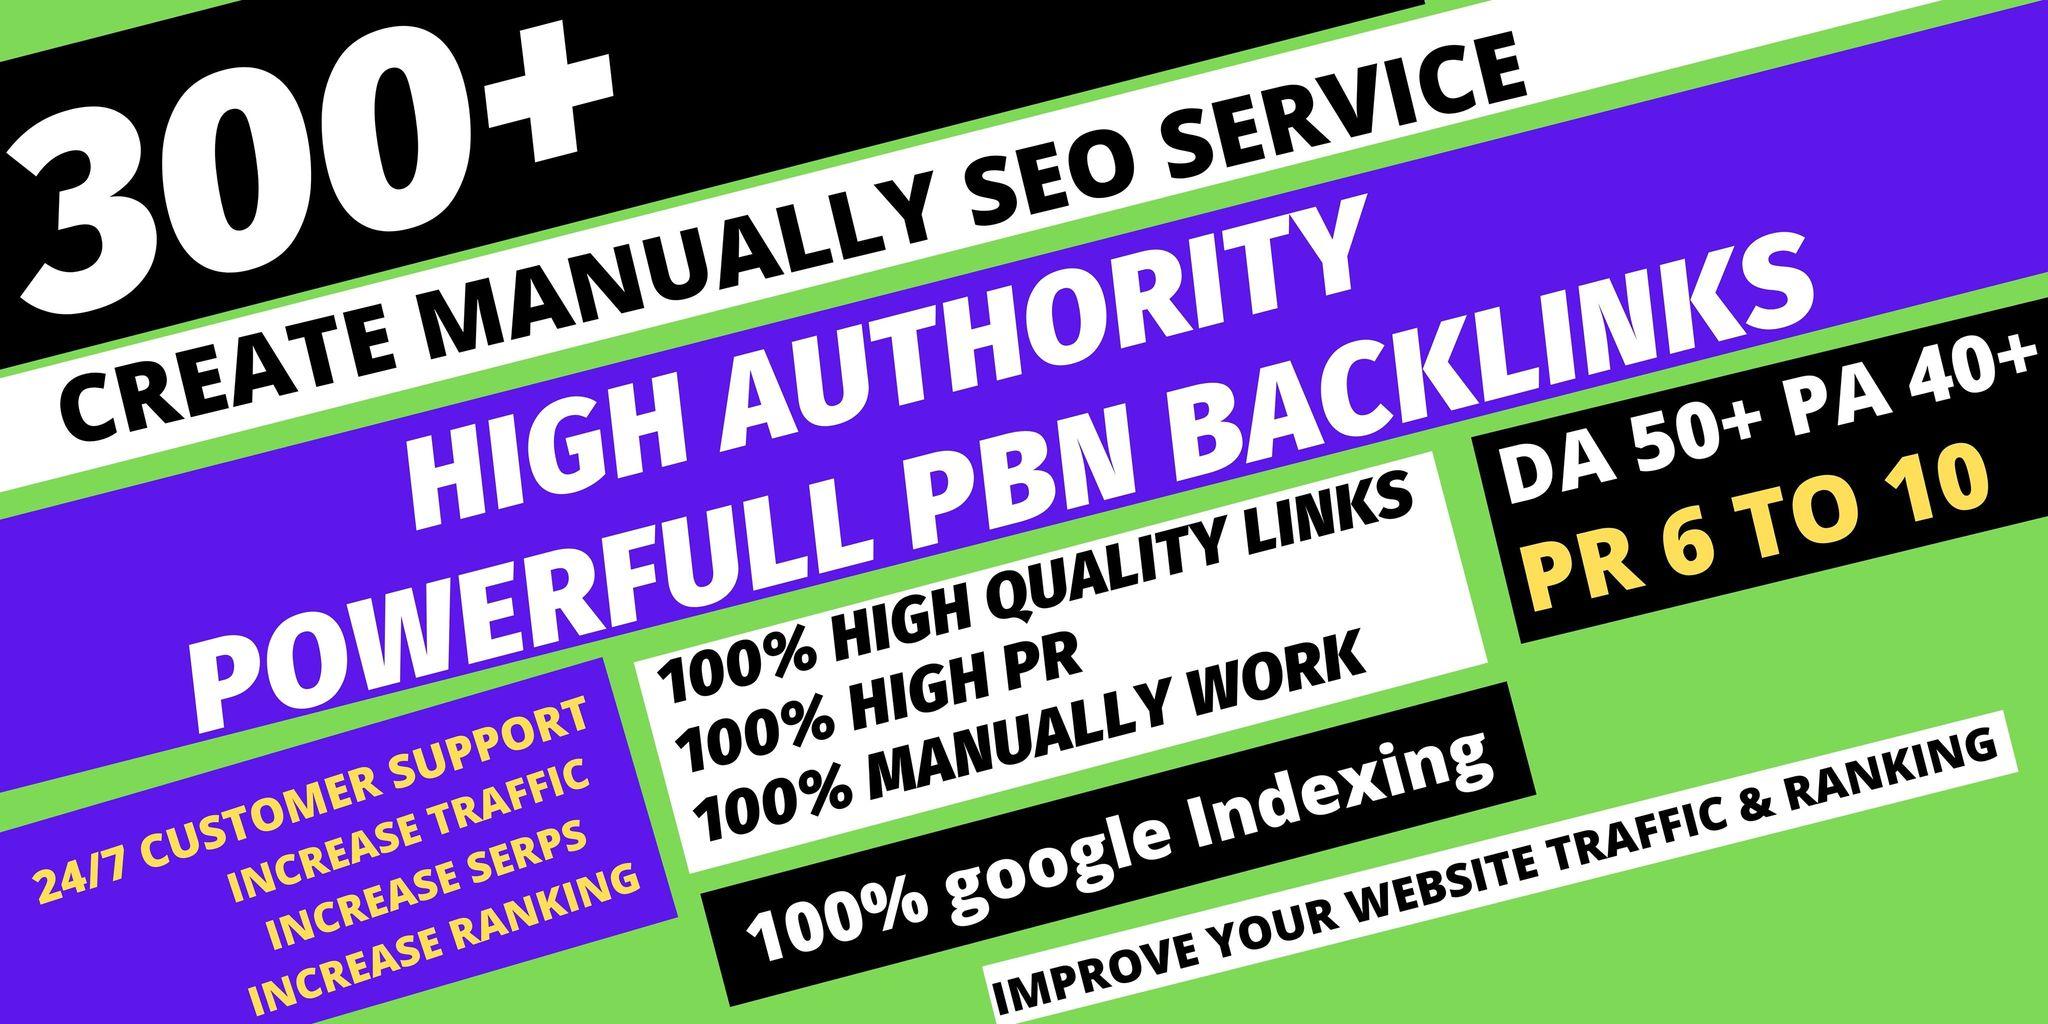 get premium permanent 300 Pbn Backlink DA50+PA40+PR6+homepage web 2.0 with dofollow 50 unique site